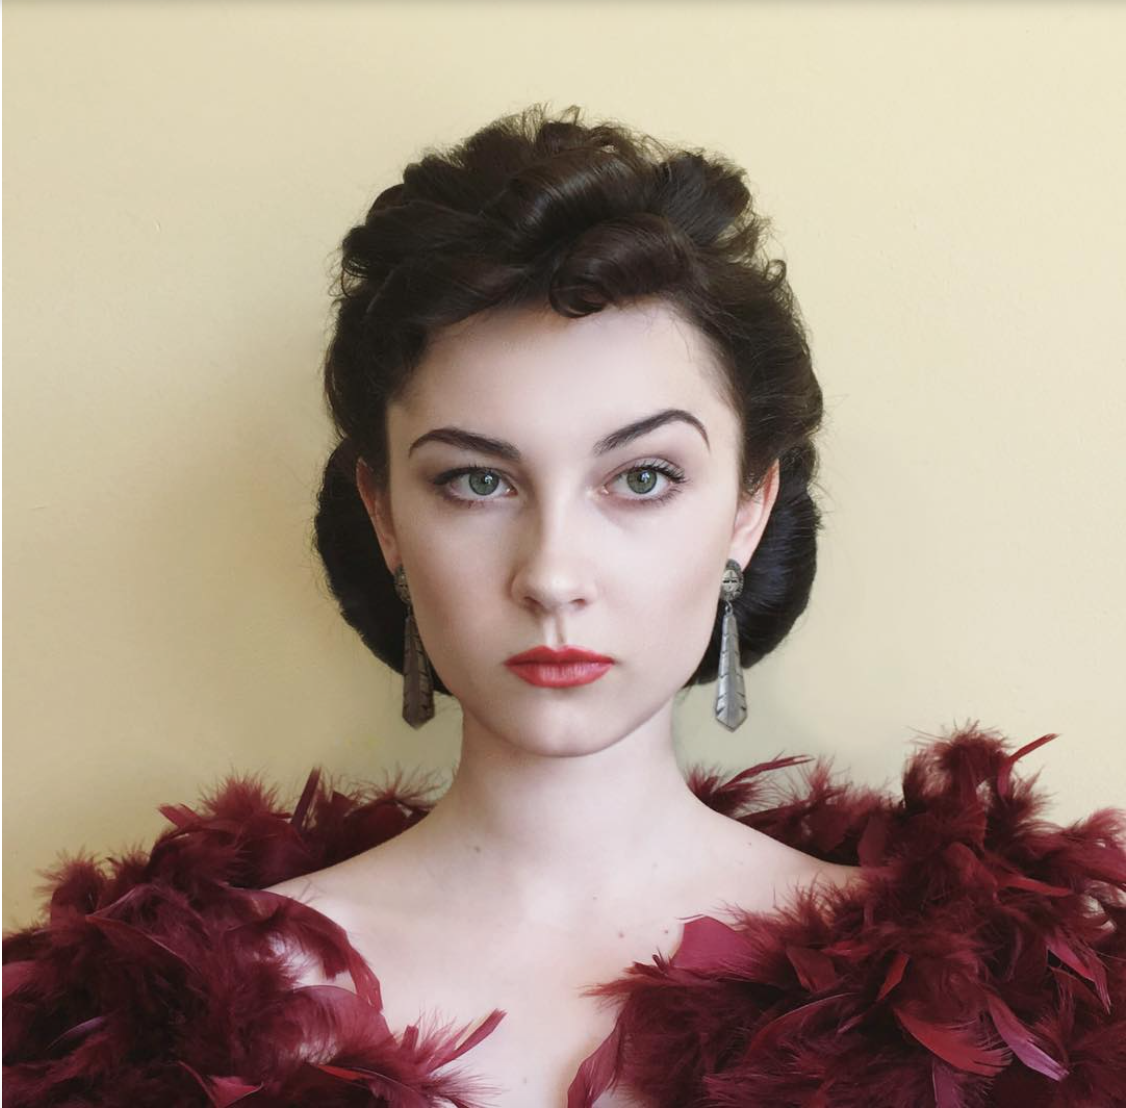 Hollywood Starlet Makeup Tutorials Her Heartland Soul